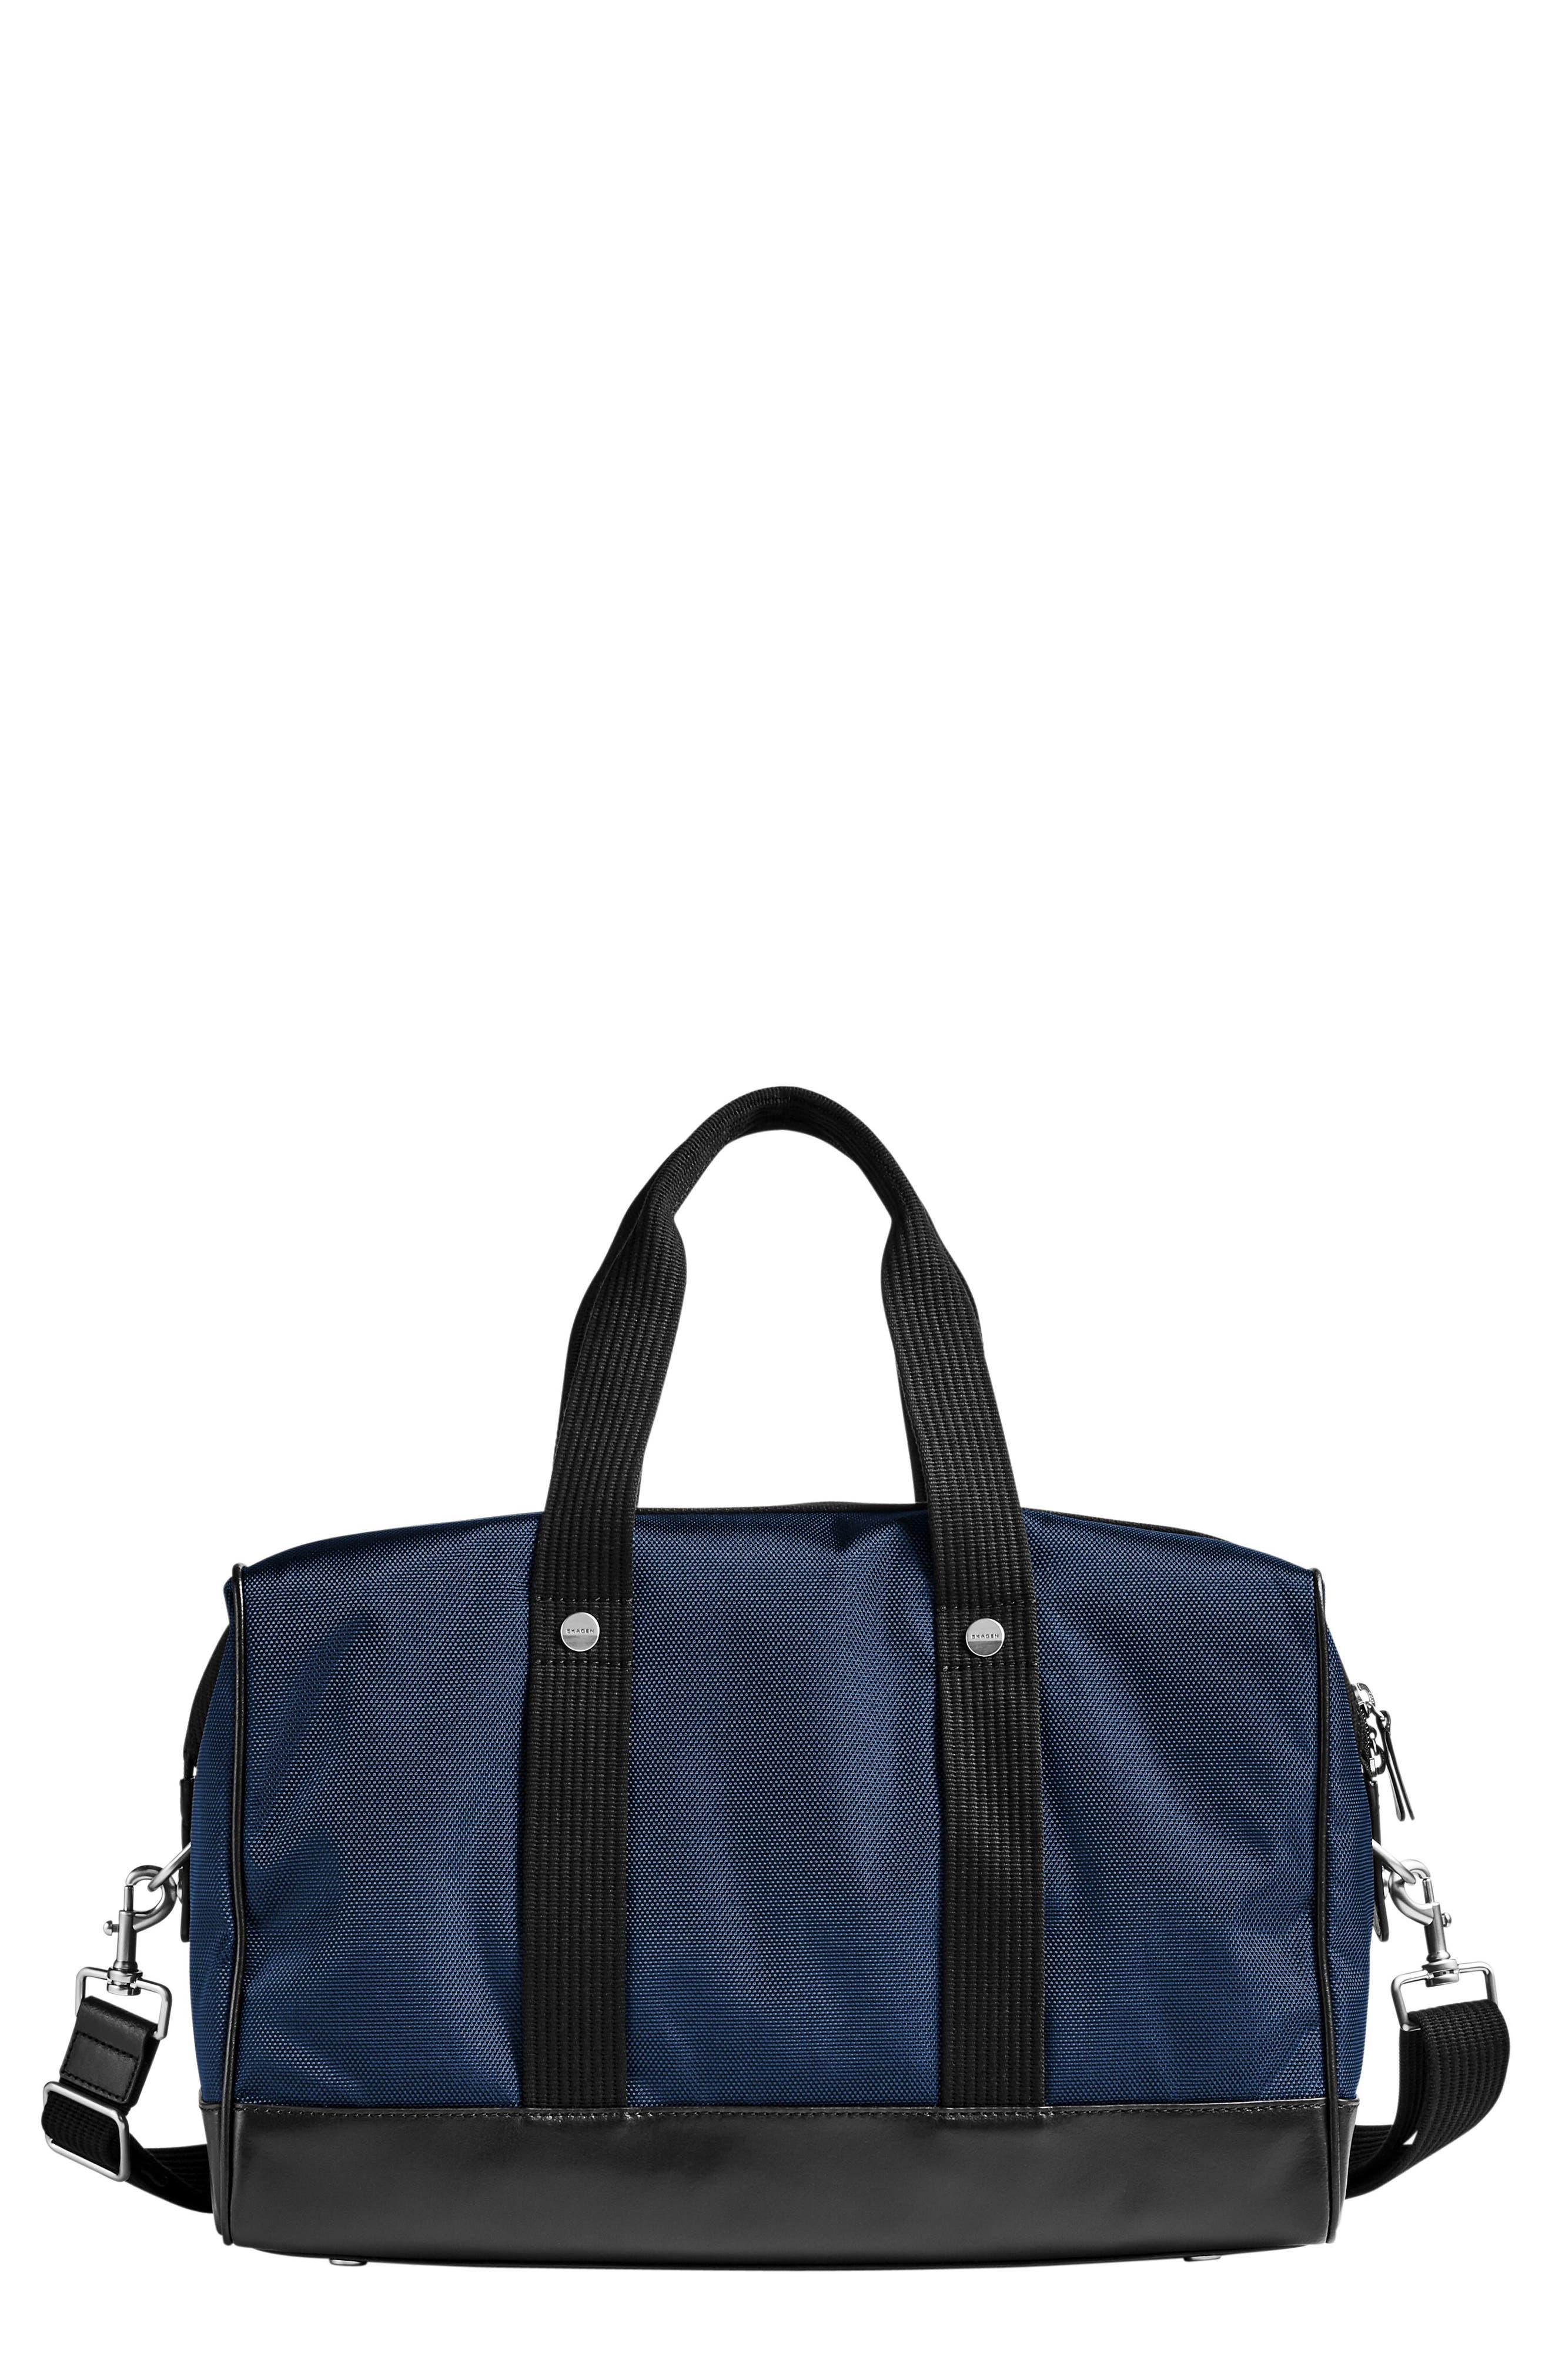 Main Image - Skagen Krinsen Duffel Bag